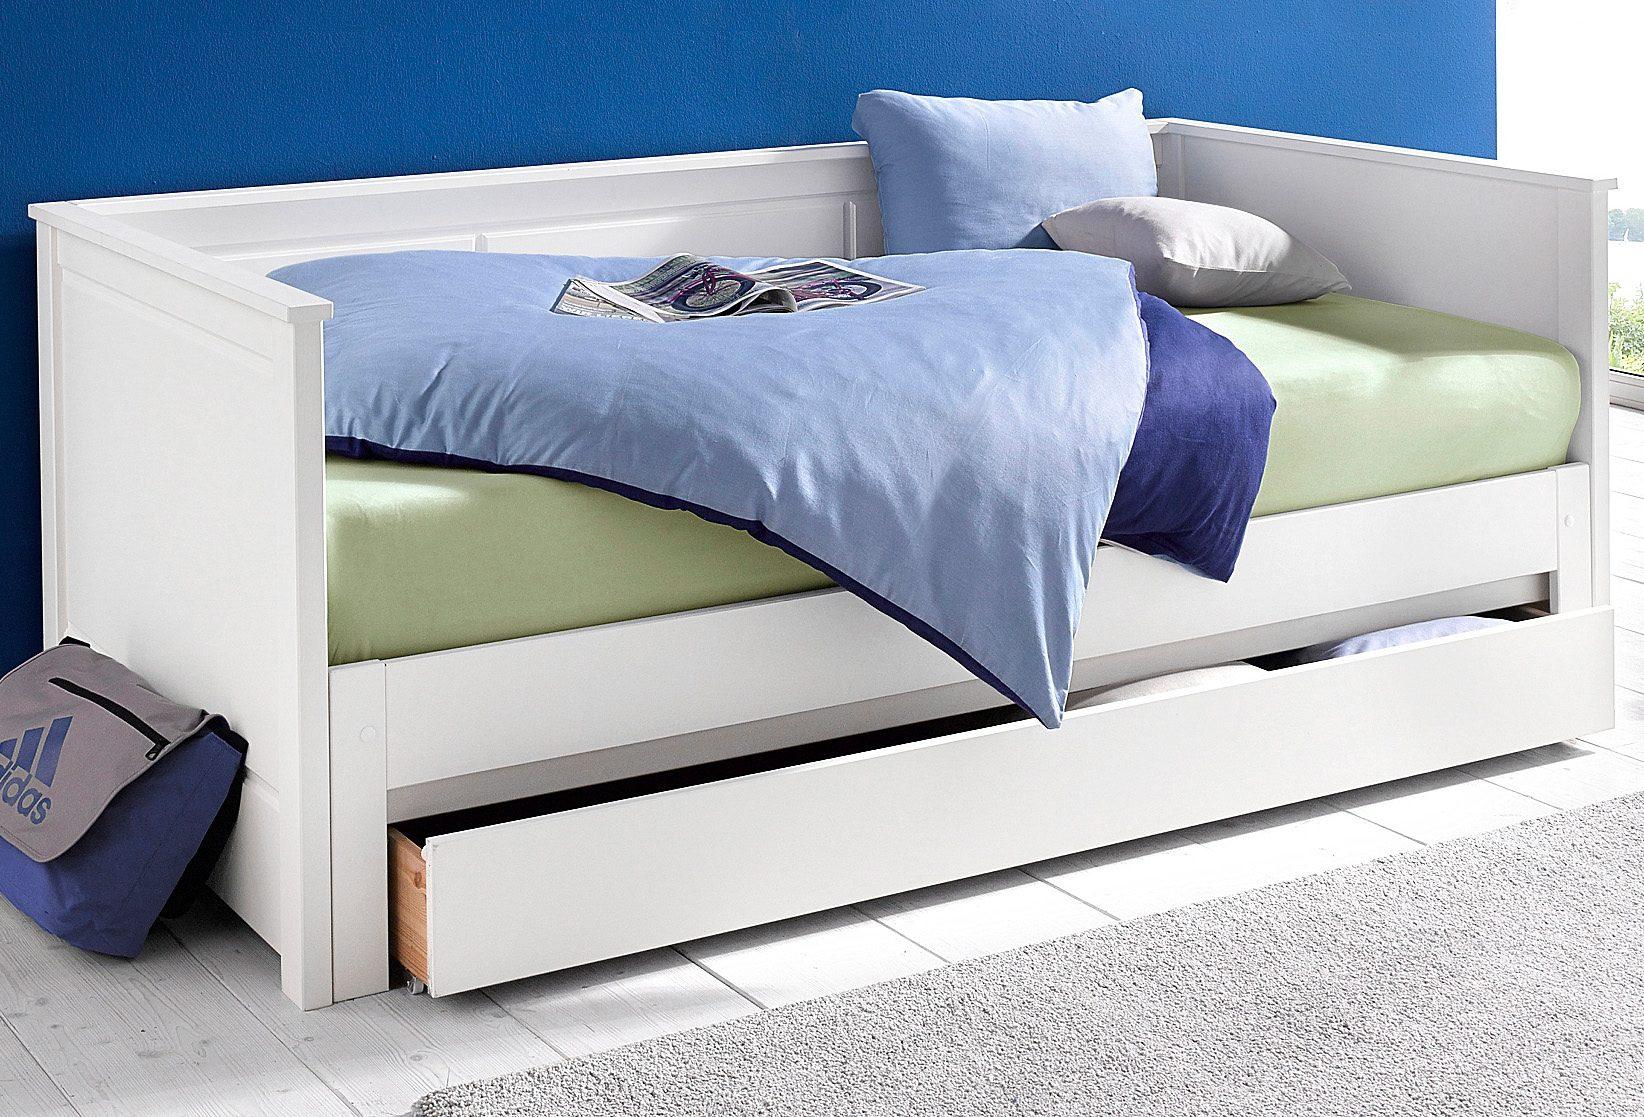 Funktionsbett | Schlafzimmer > Betten > Funktionsbetten | QUELLE